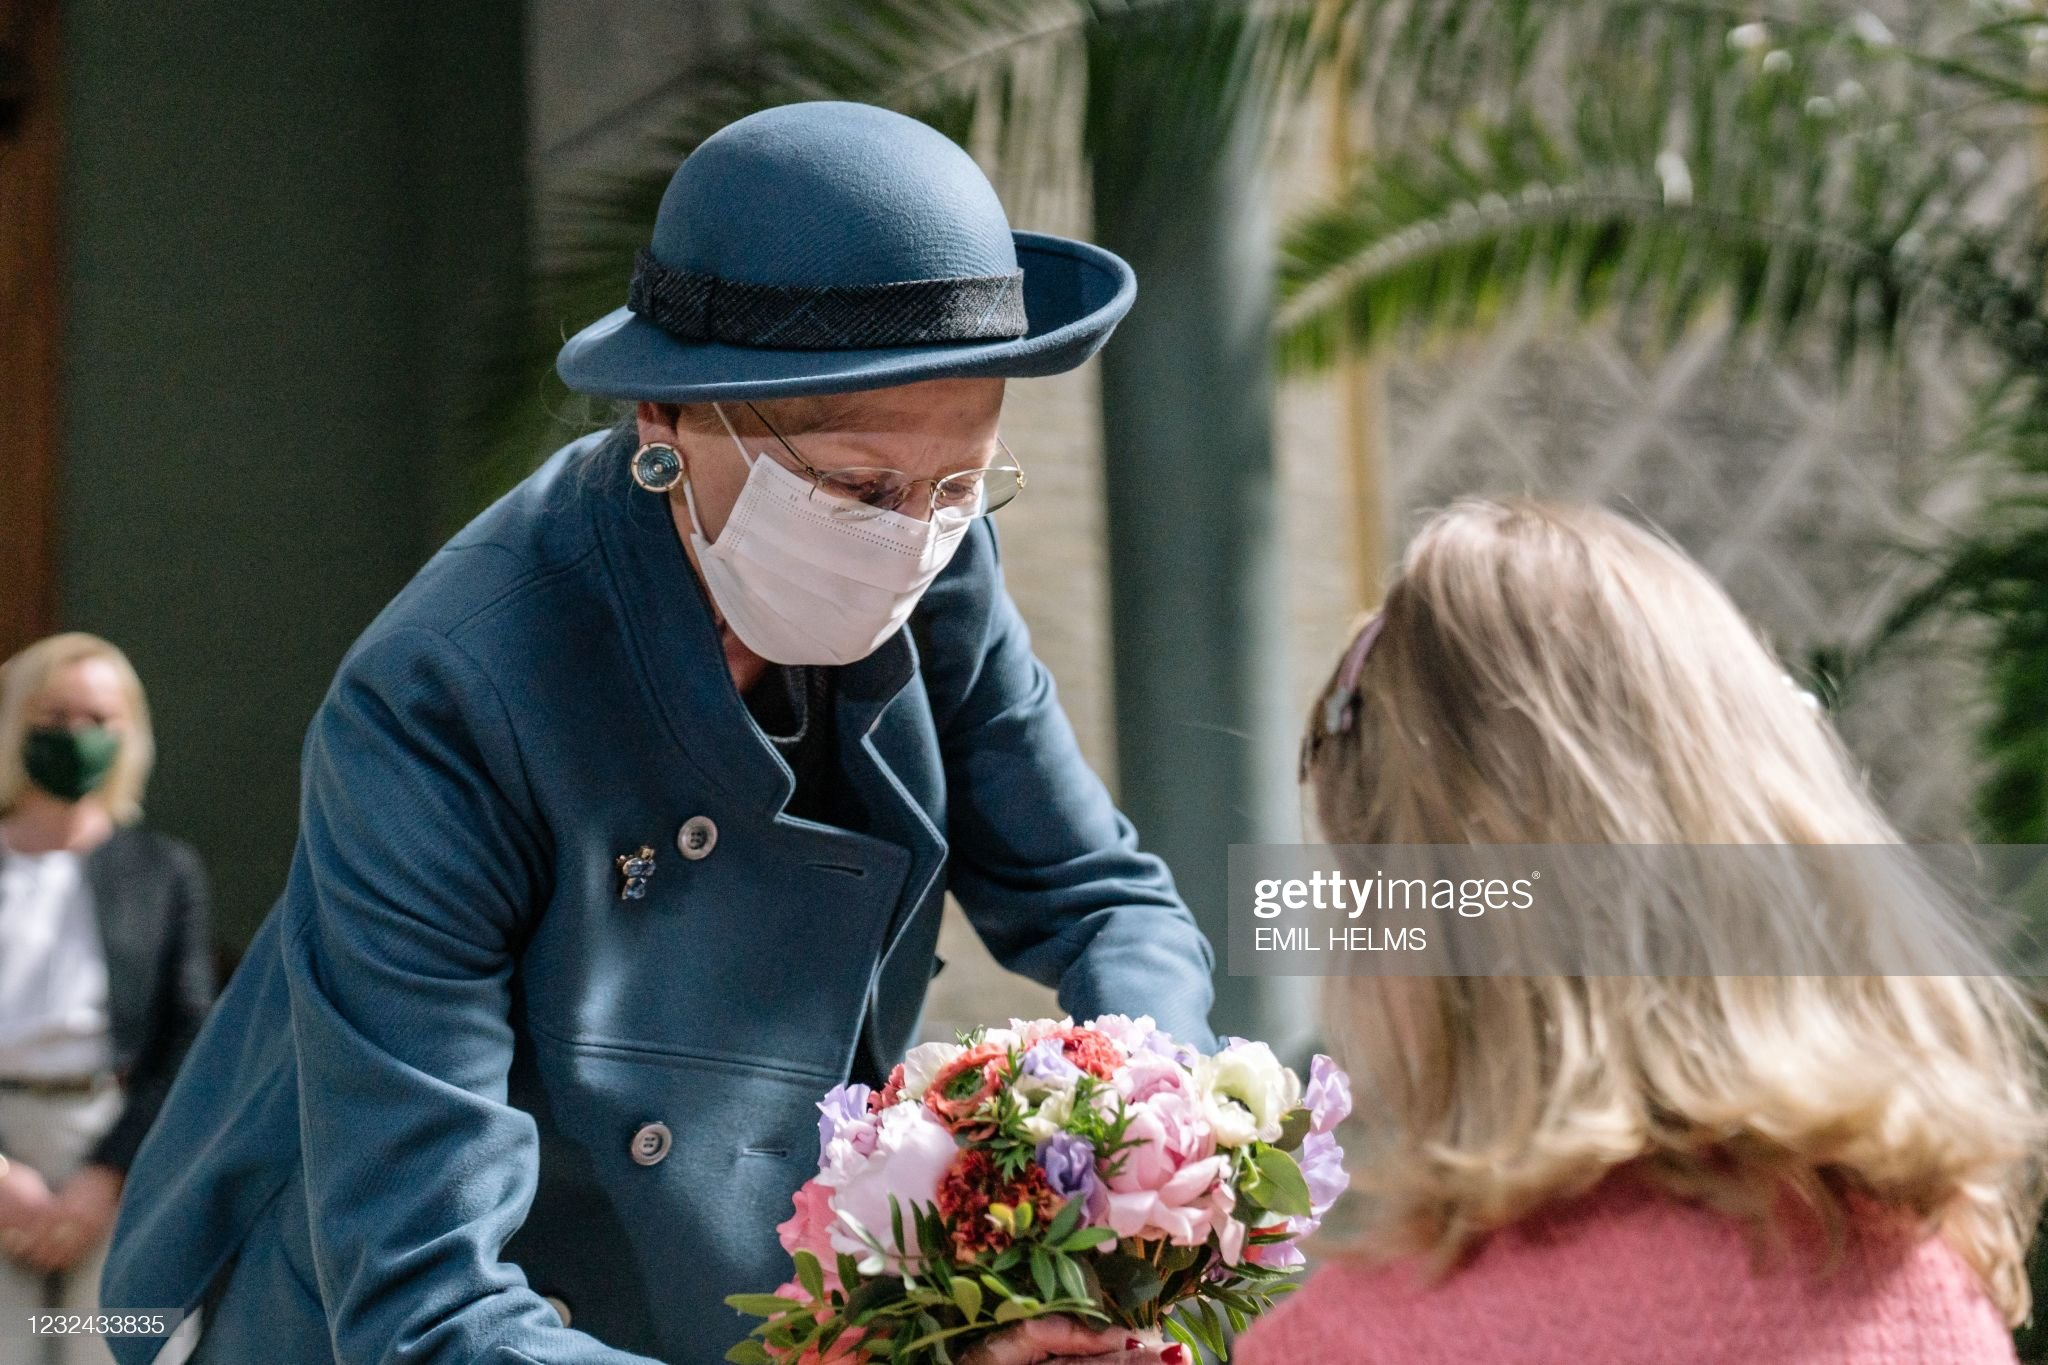 DENMARK-HEALTH-VIRUS-MUSEUM-ROYALS : News Photo